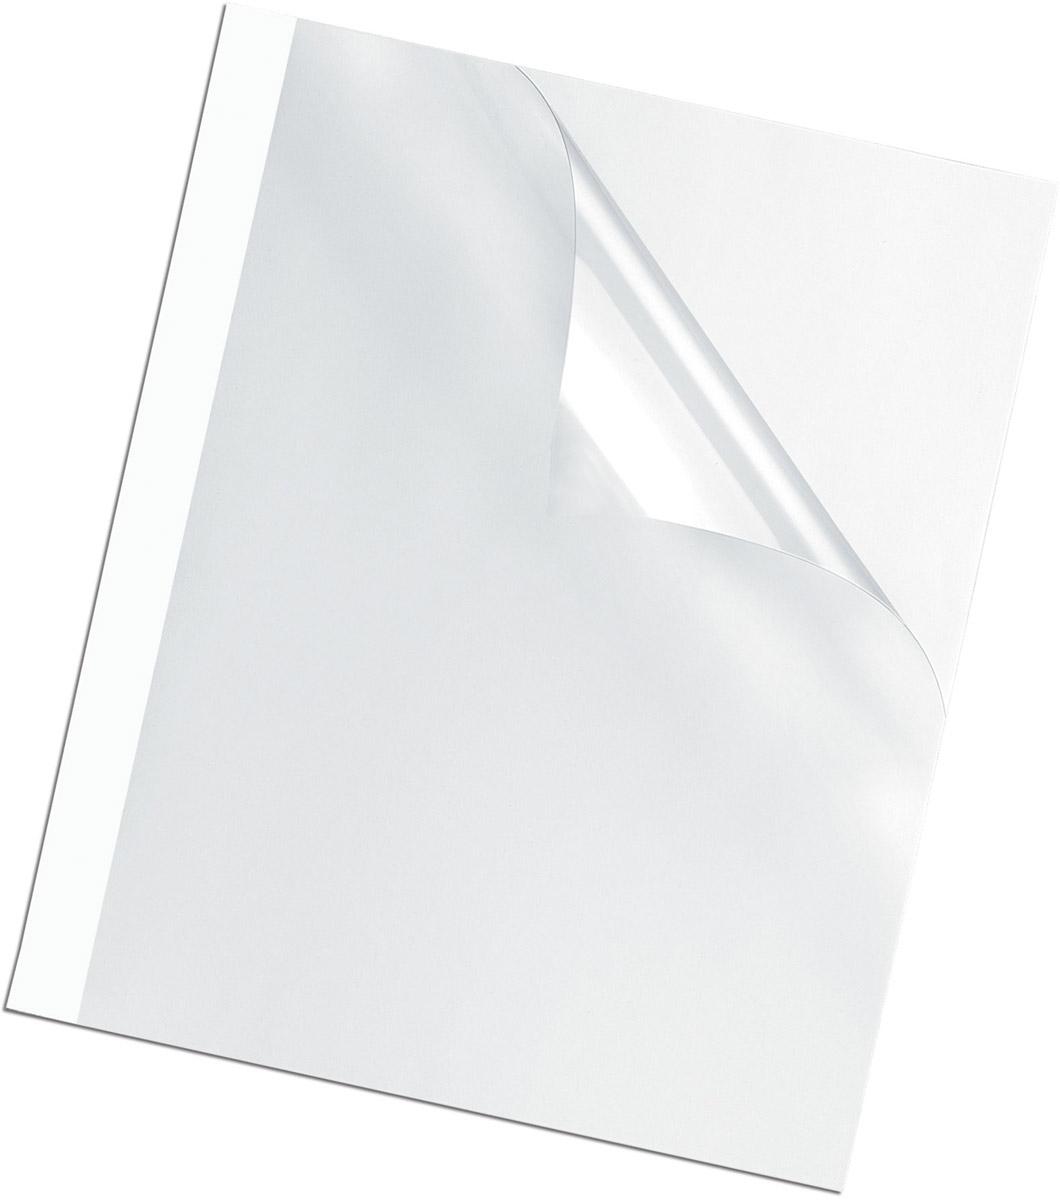 Fellowes A4 FS-53151 обложка для термопереплета, 15 мм (100 шт)